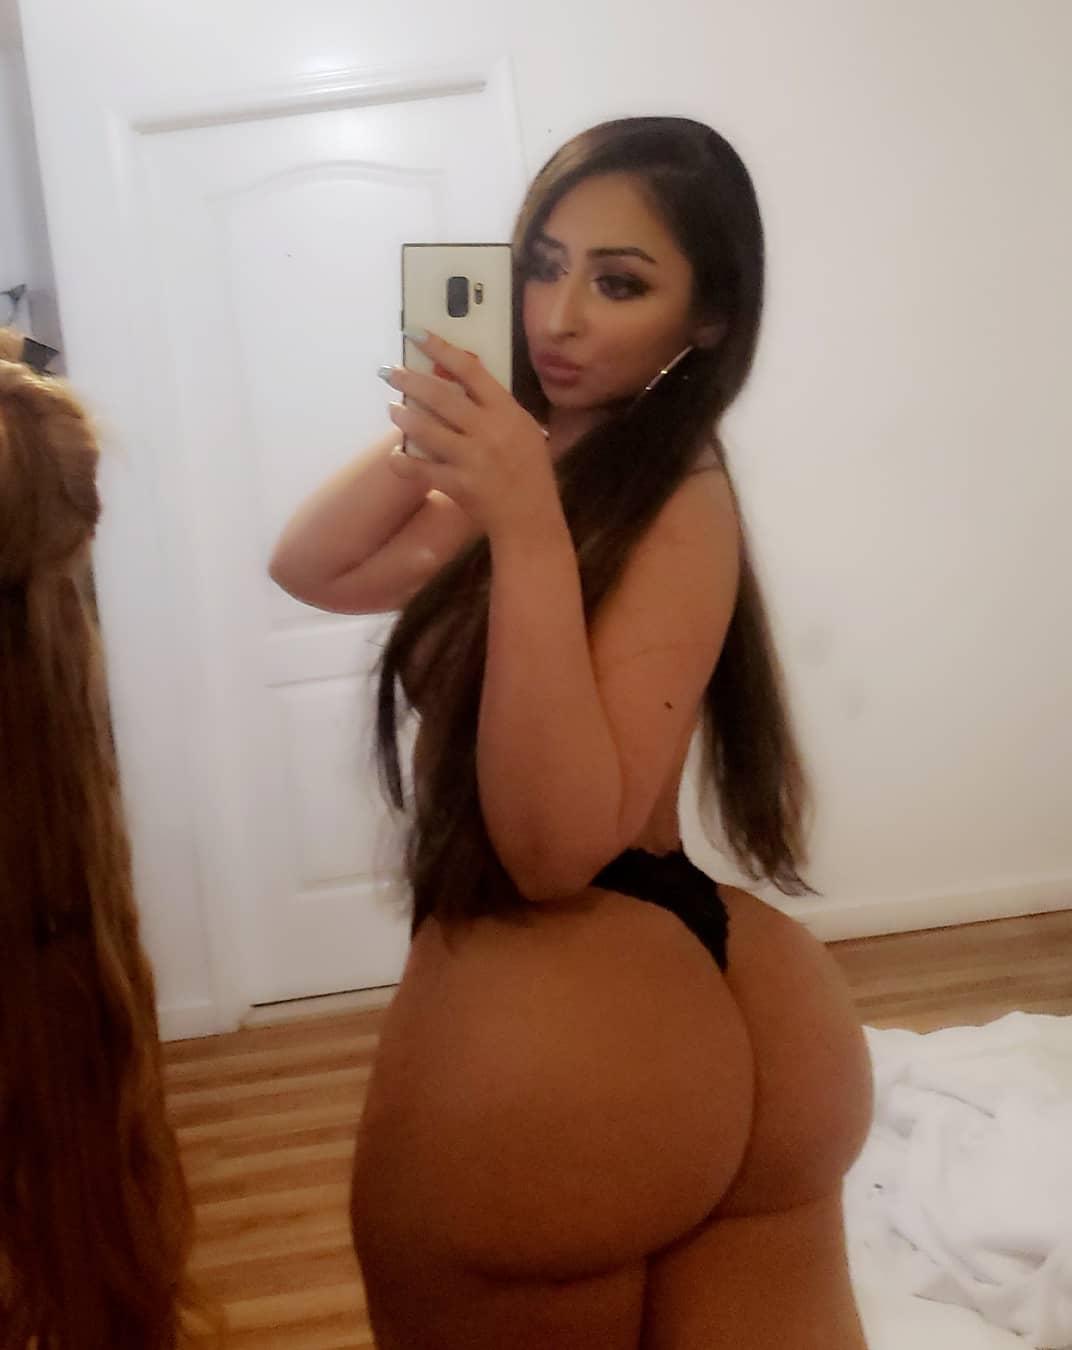 indian randi nangi pics 17 - Desi Randi Ki chudai Sexy Nude Gand Chut Pics